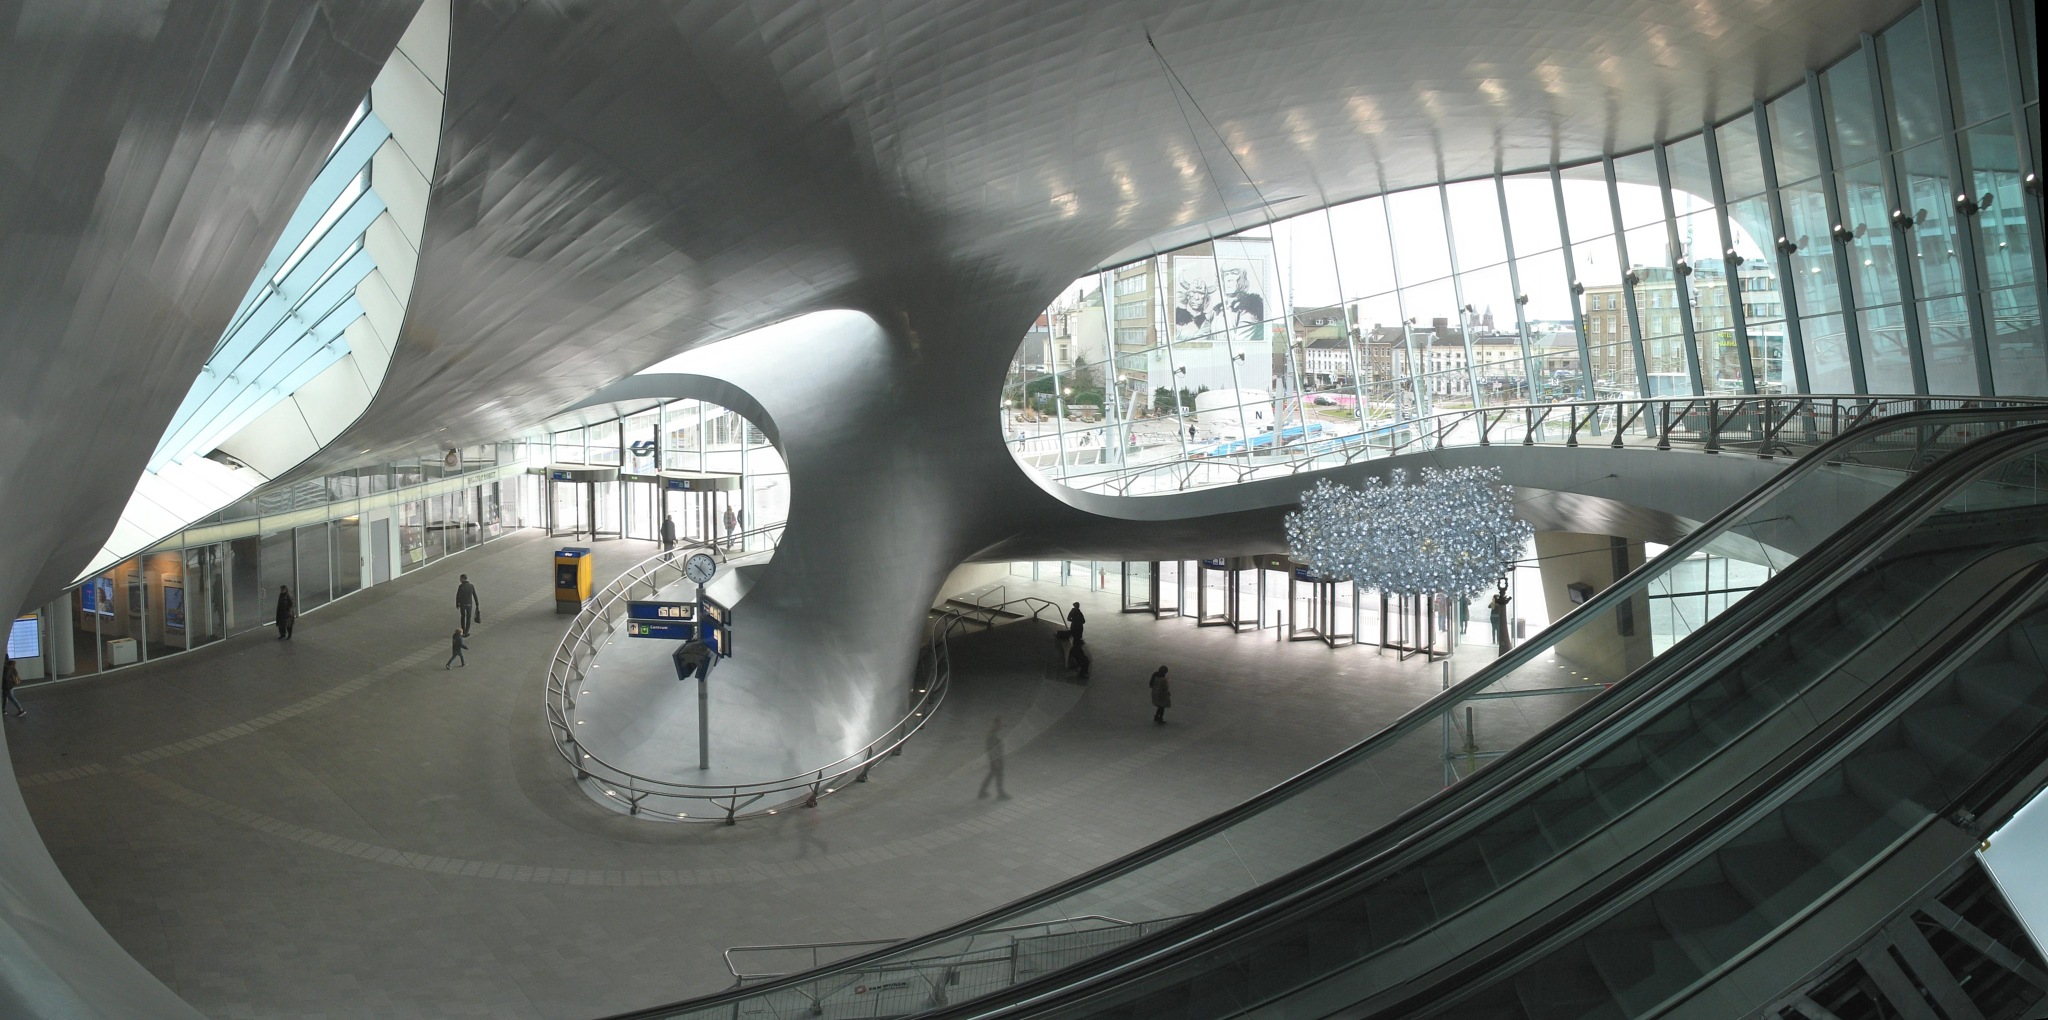 NS Station Arnhem by Fokko Verboom